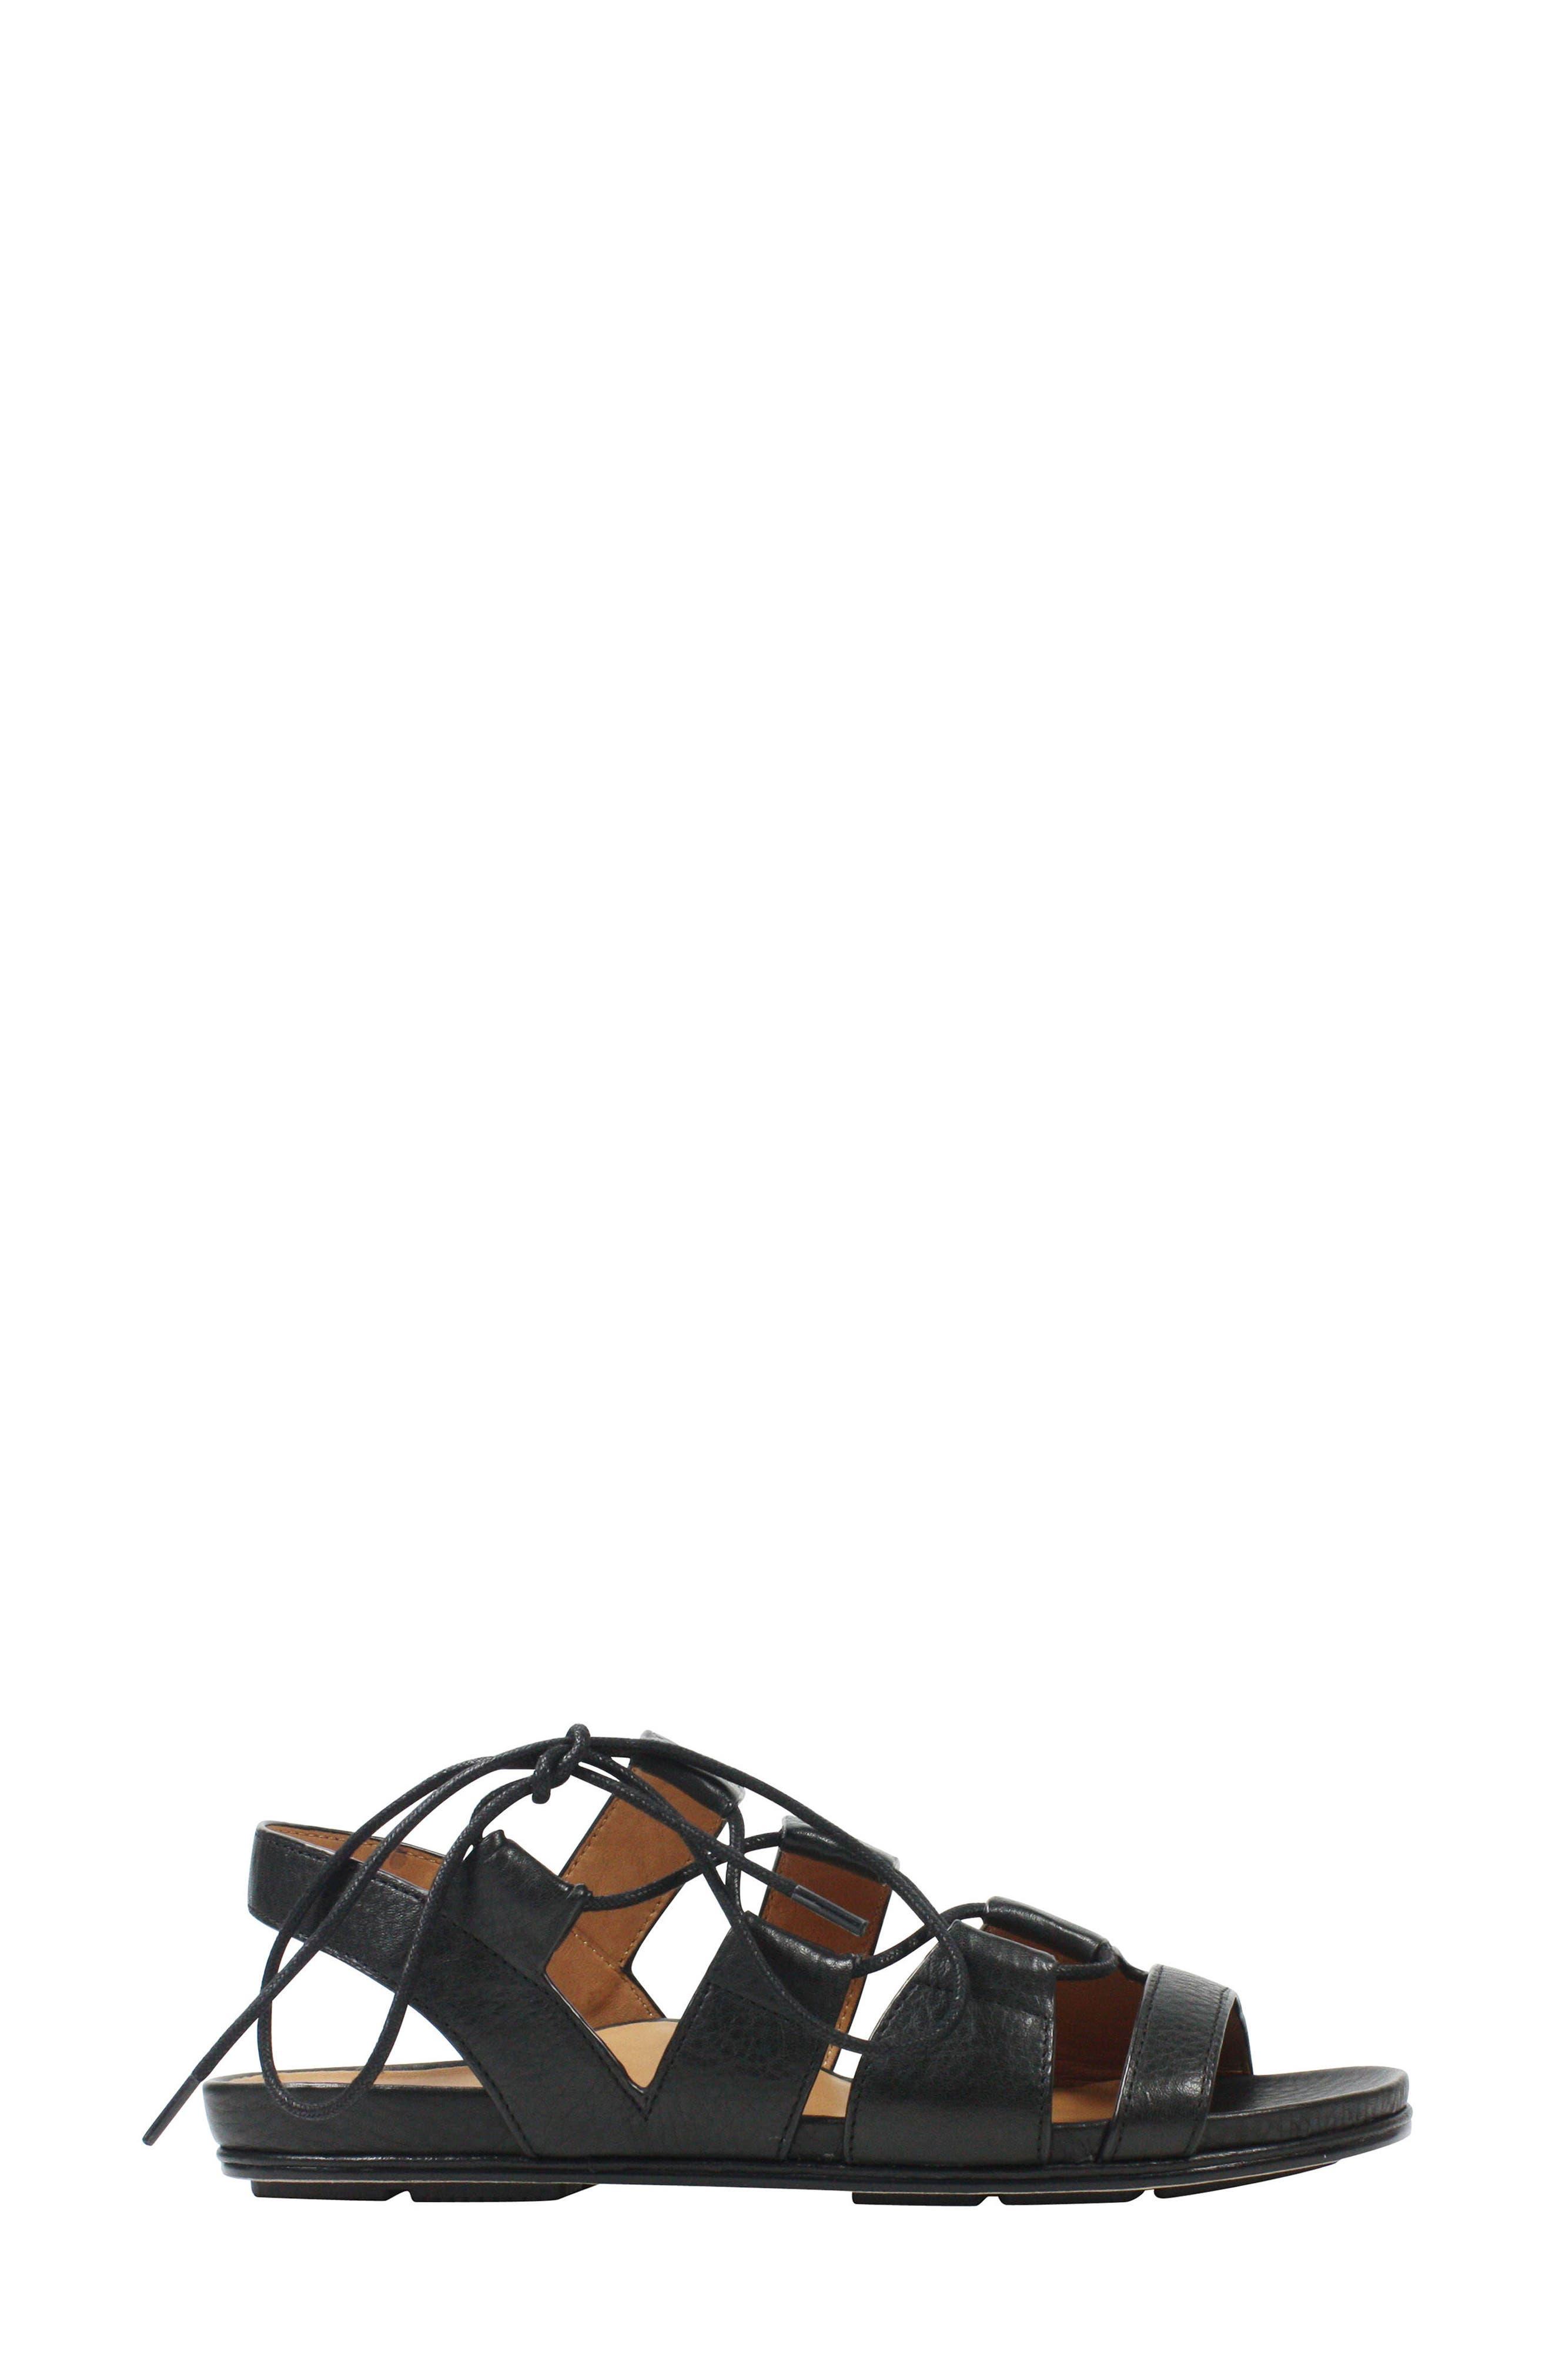 Digbee Sandal,                             Alternate thumbnail 3, color,                             Black Leather